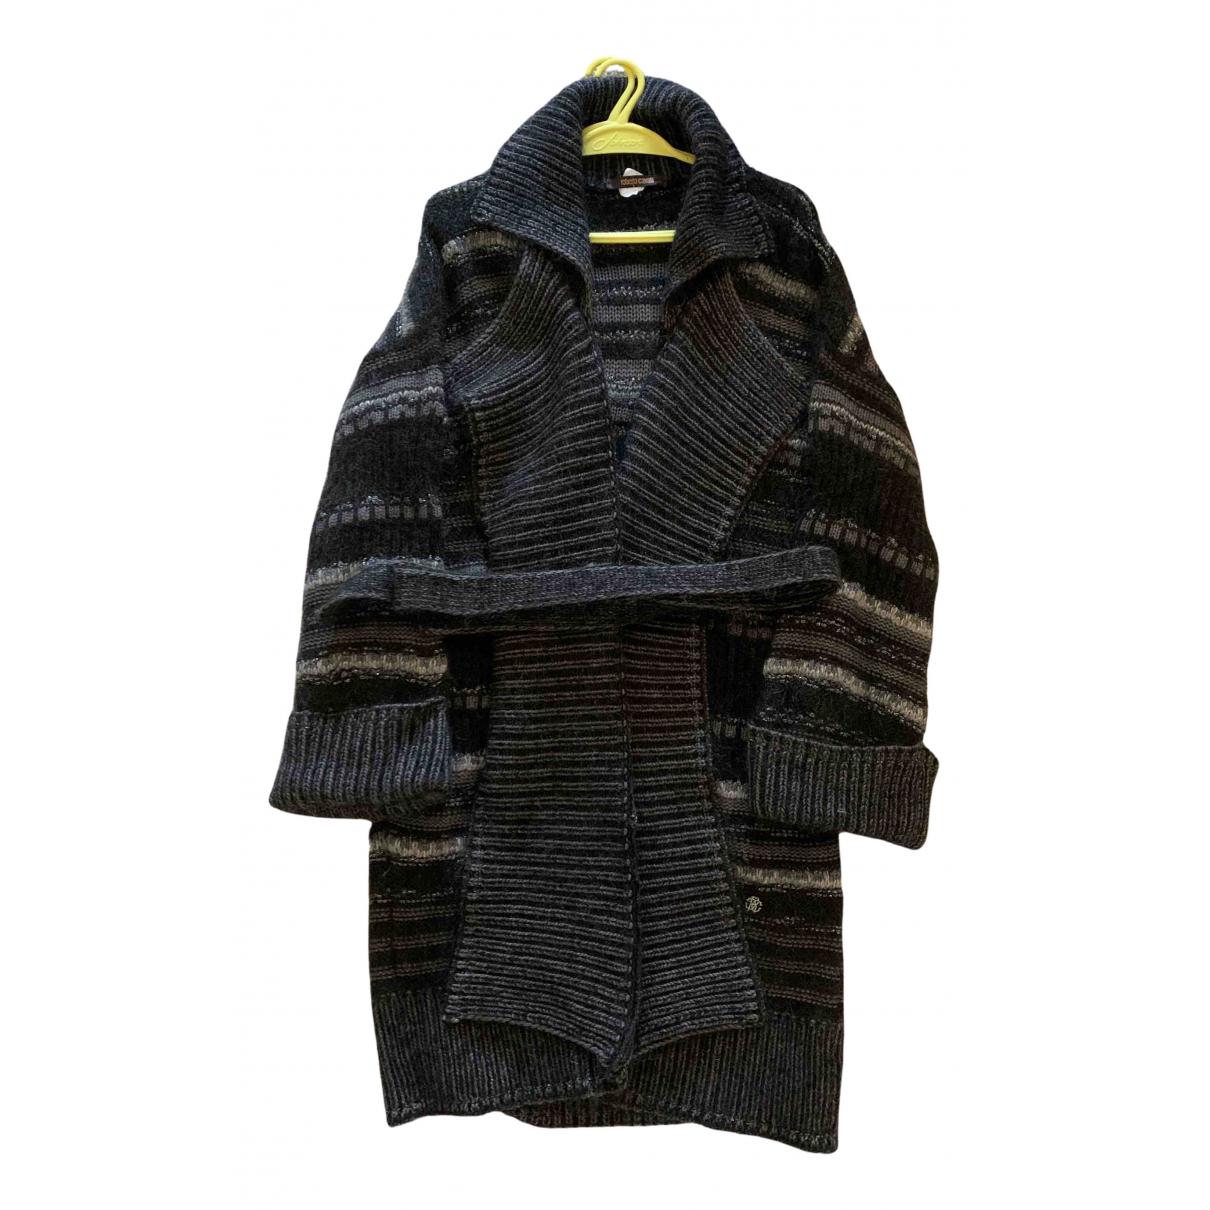 Roberto Cavalli - Pull   pour femme en laine - anthracite